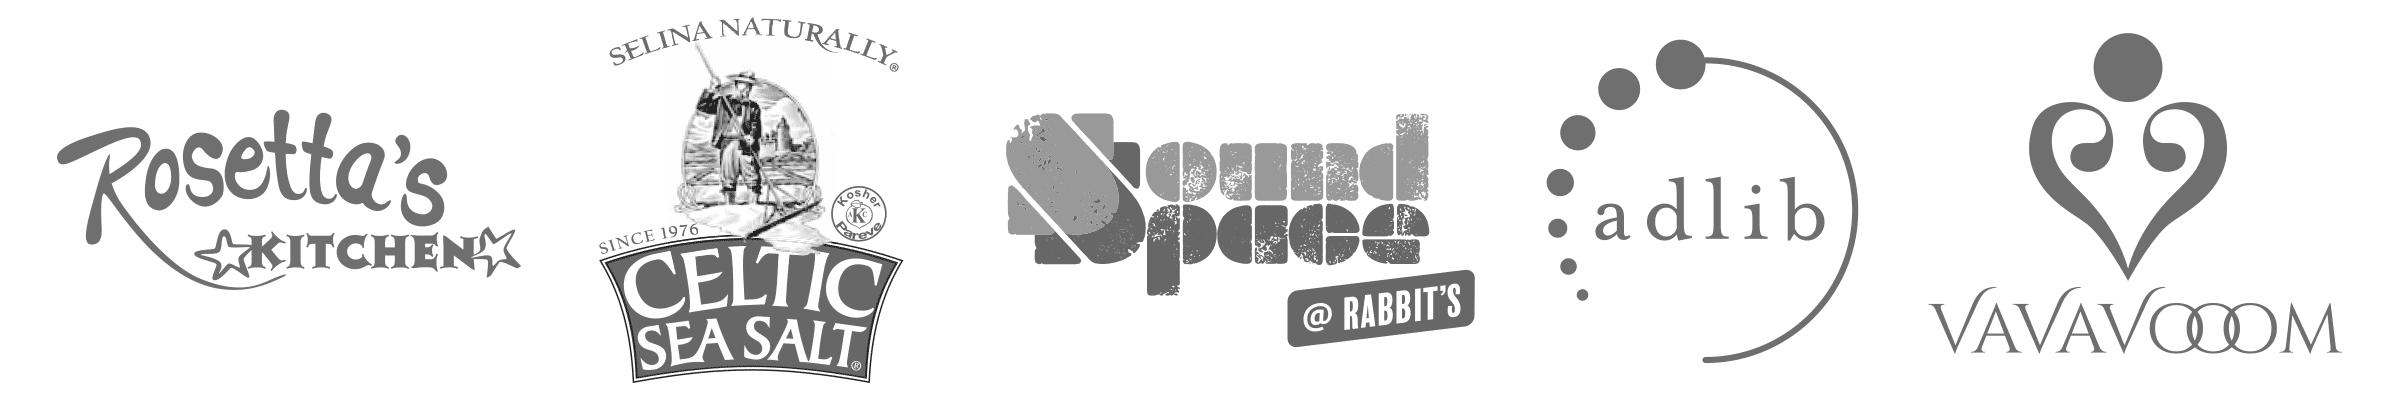 Our cliente logos. Rosetta's, Celtic Sea Salt, Sound Space Asheville and Adlib Clothing.